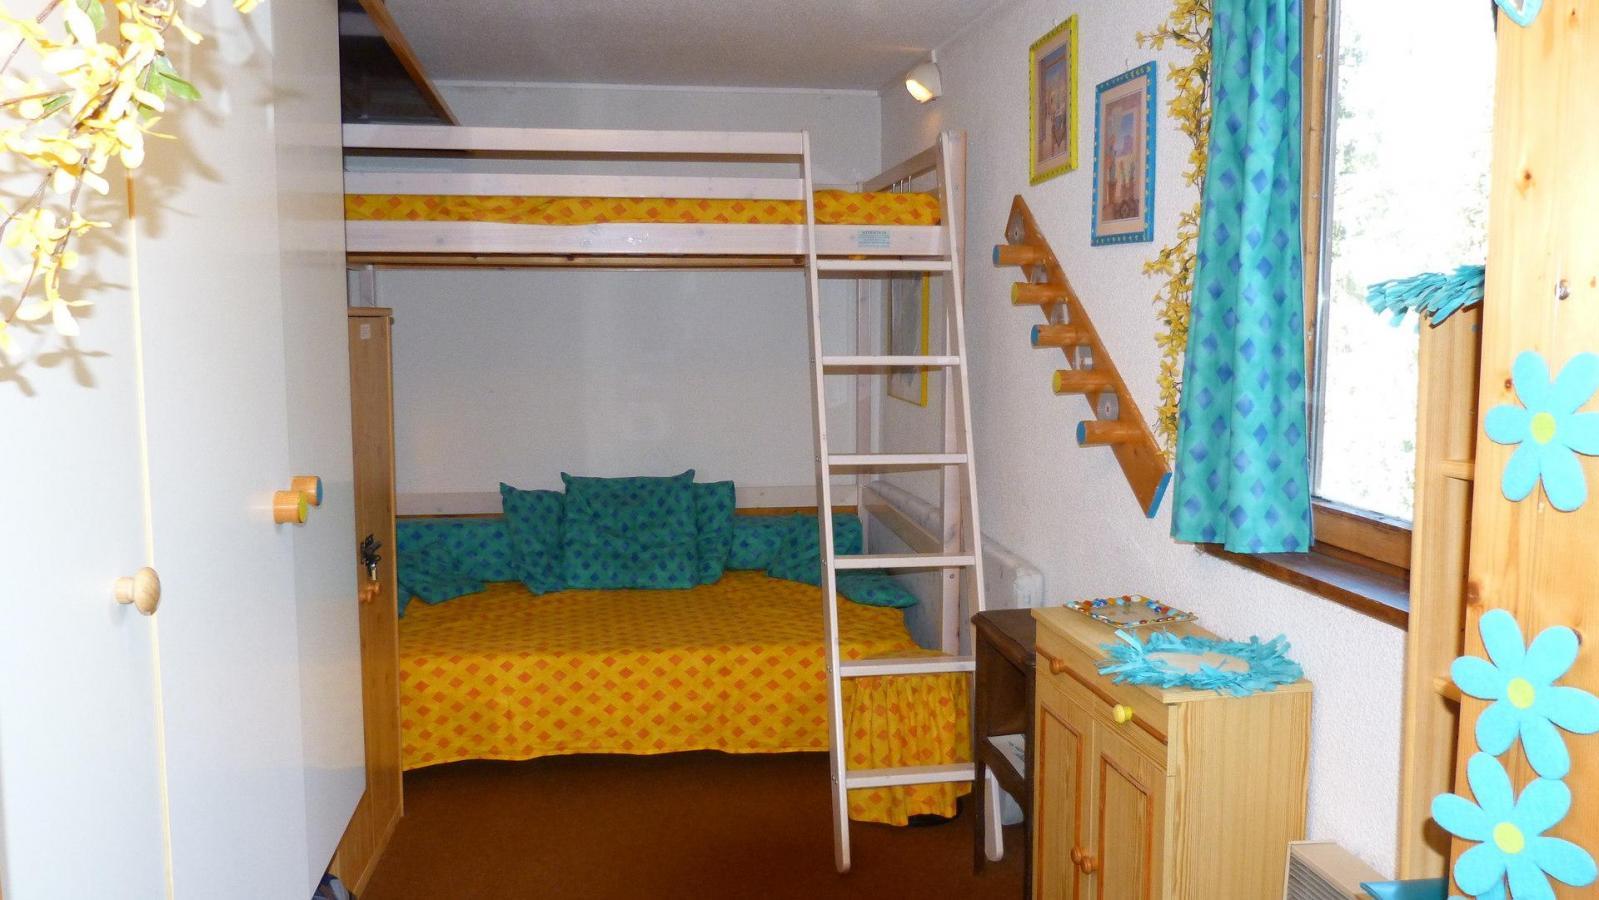 Location au ski Studio 3 personnes (911) - Residence Nova - Les Arcs